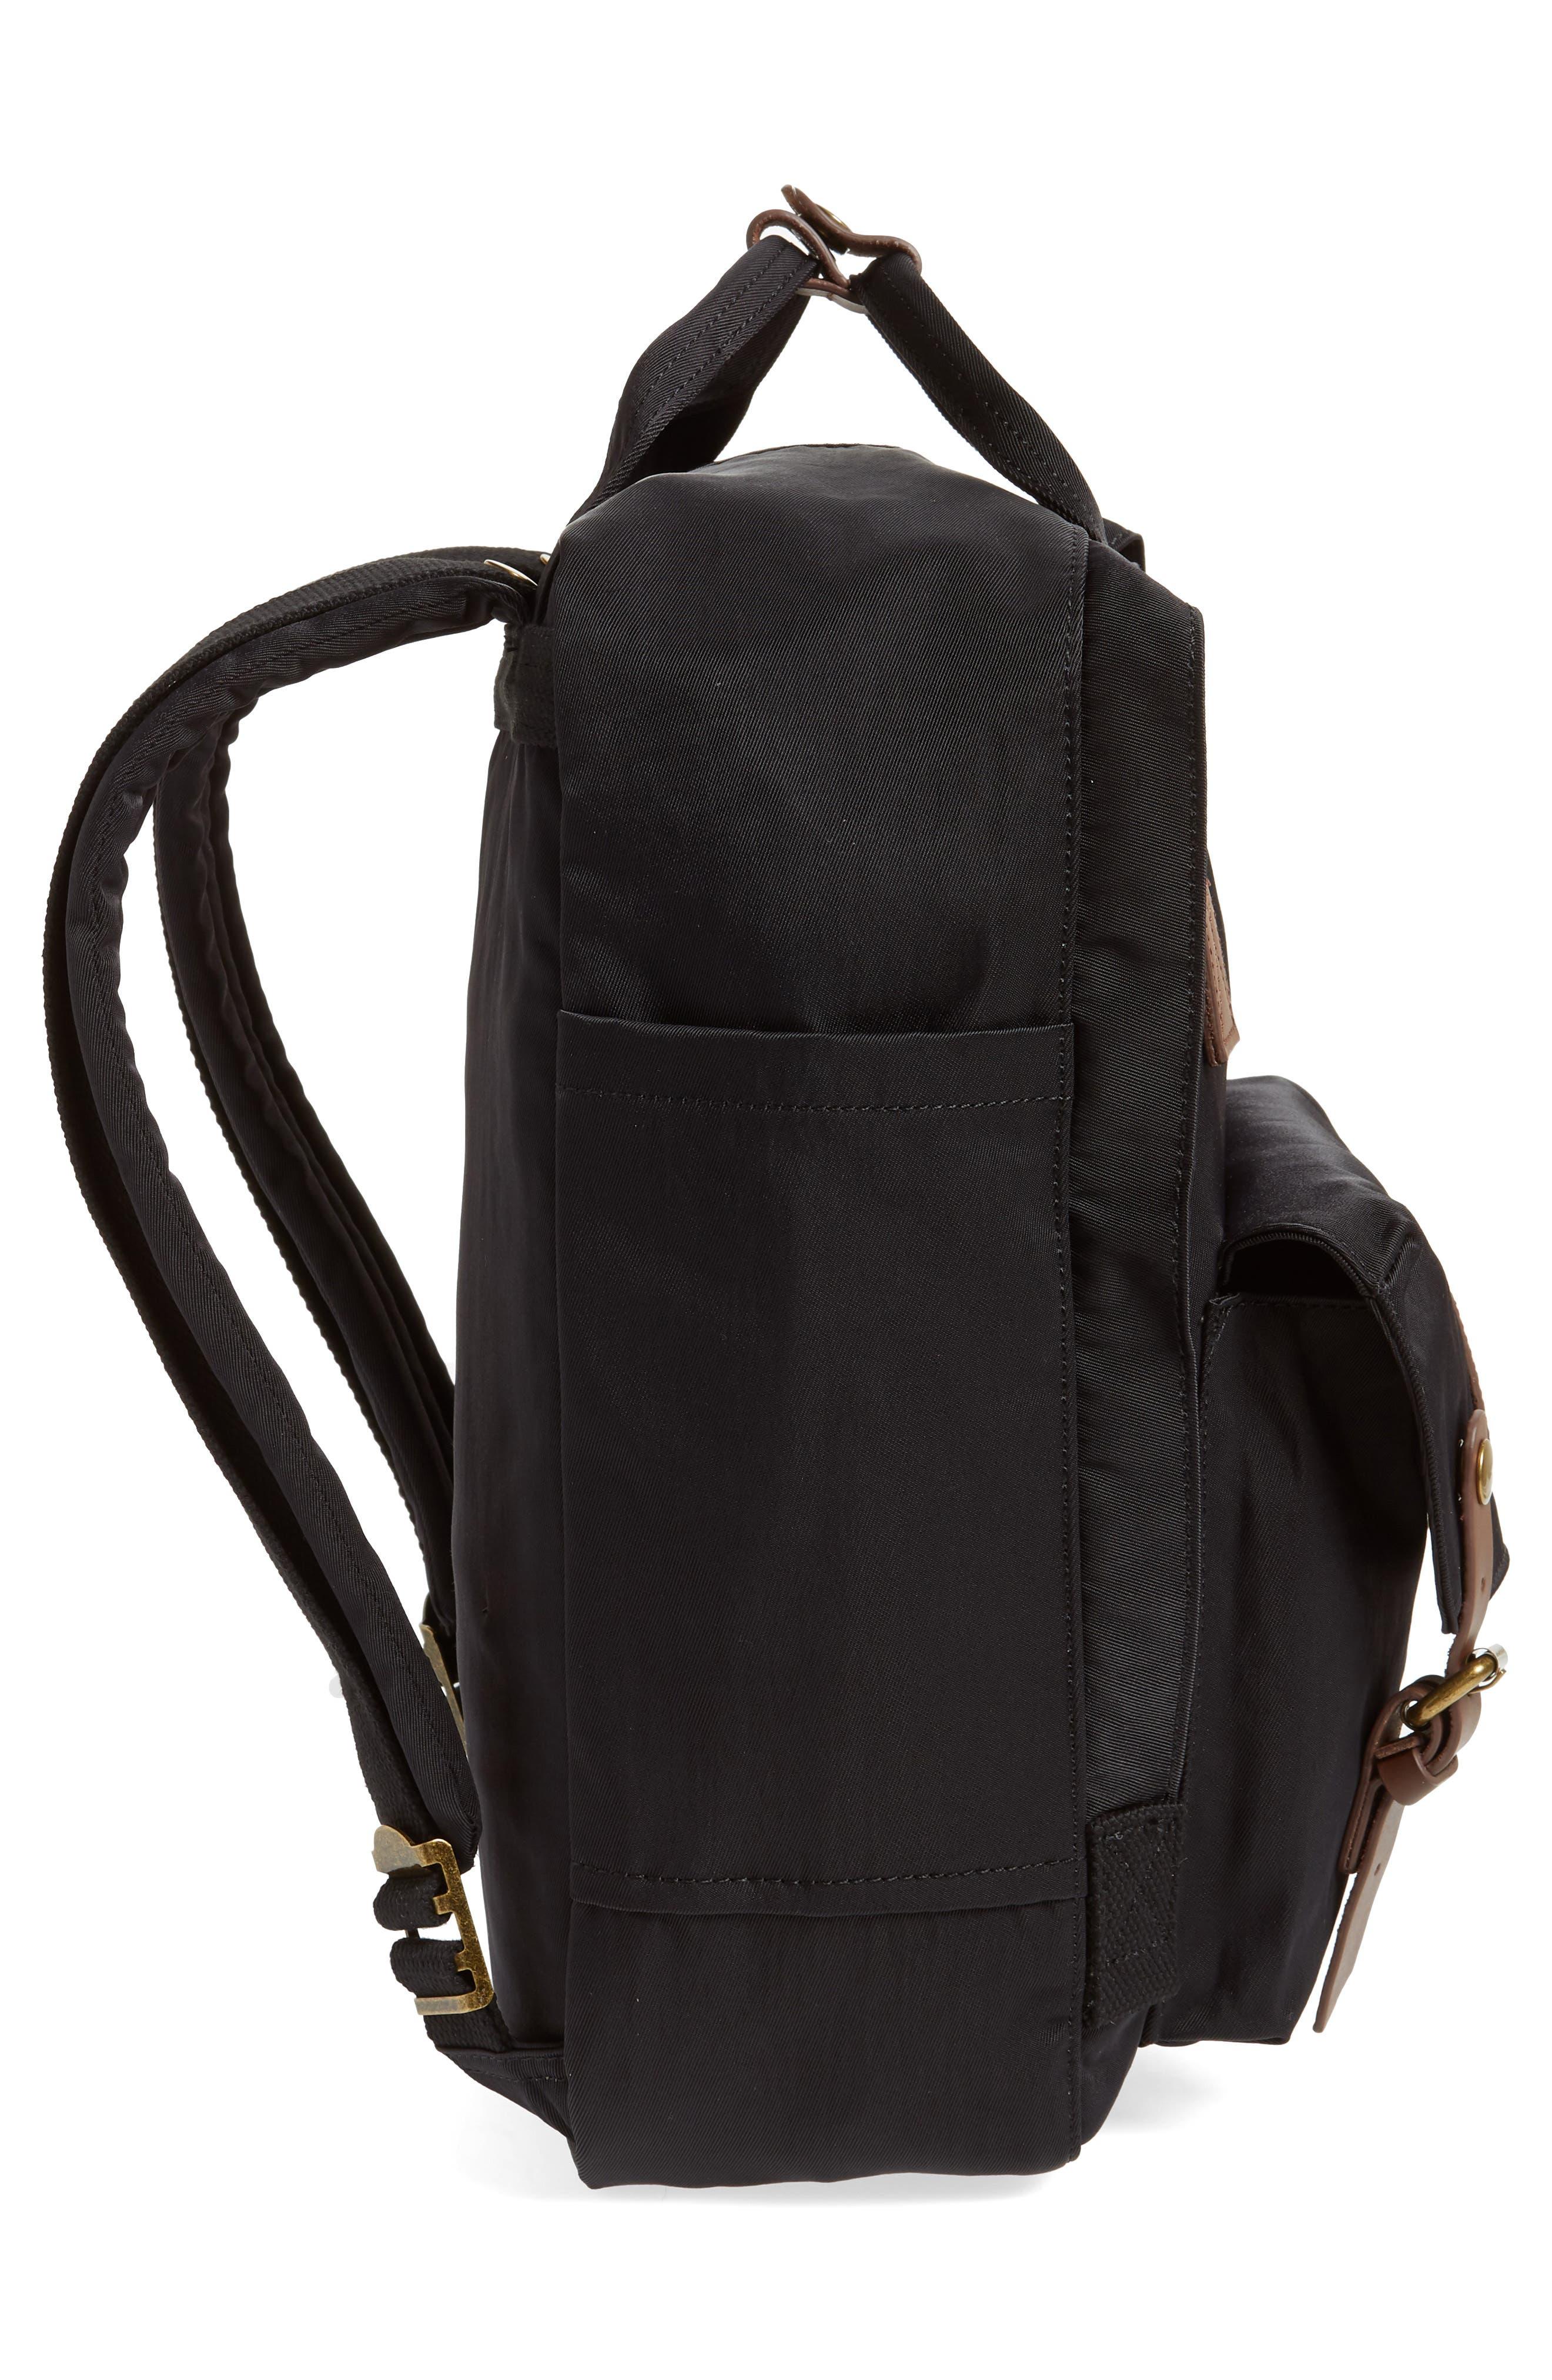 Macaroon Water Resistant Backpack,                             Alternate thumbnail 5, color,                             BLACK